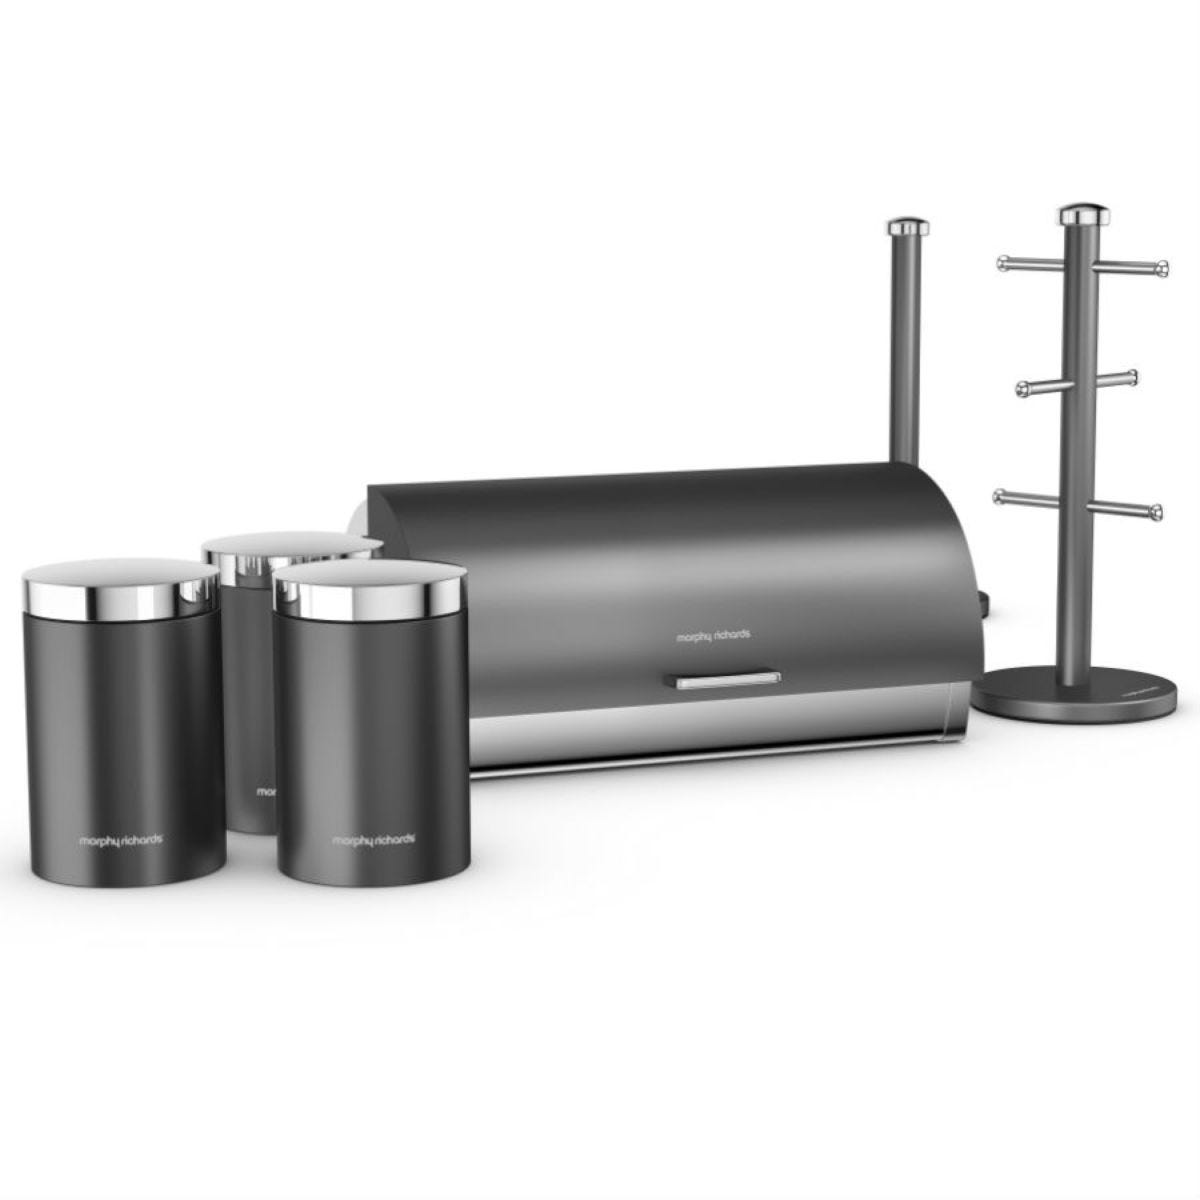 Morphy Richards Accents 6-Piece Kitchen Storage Set - Titanium